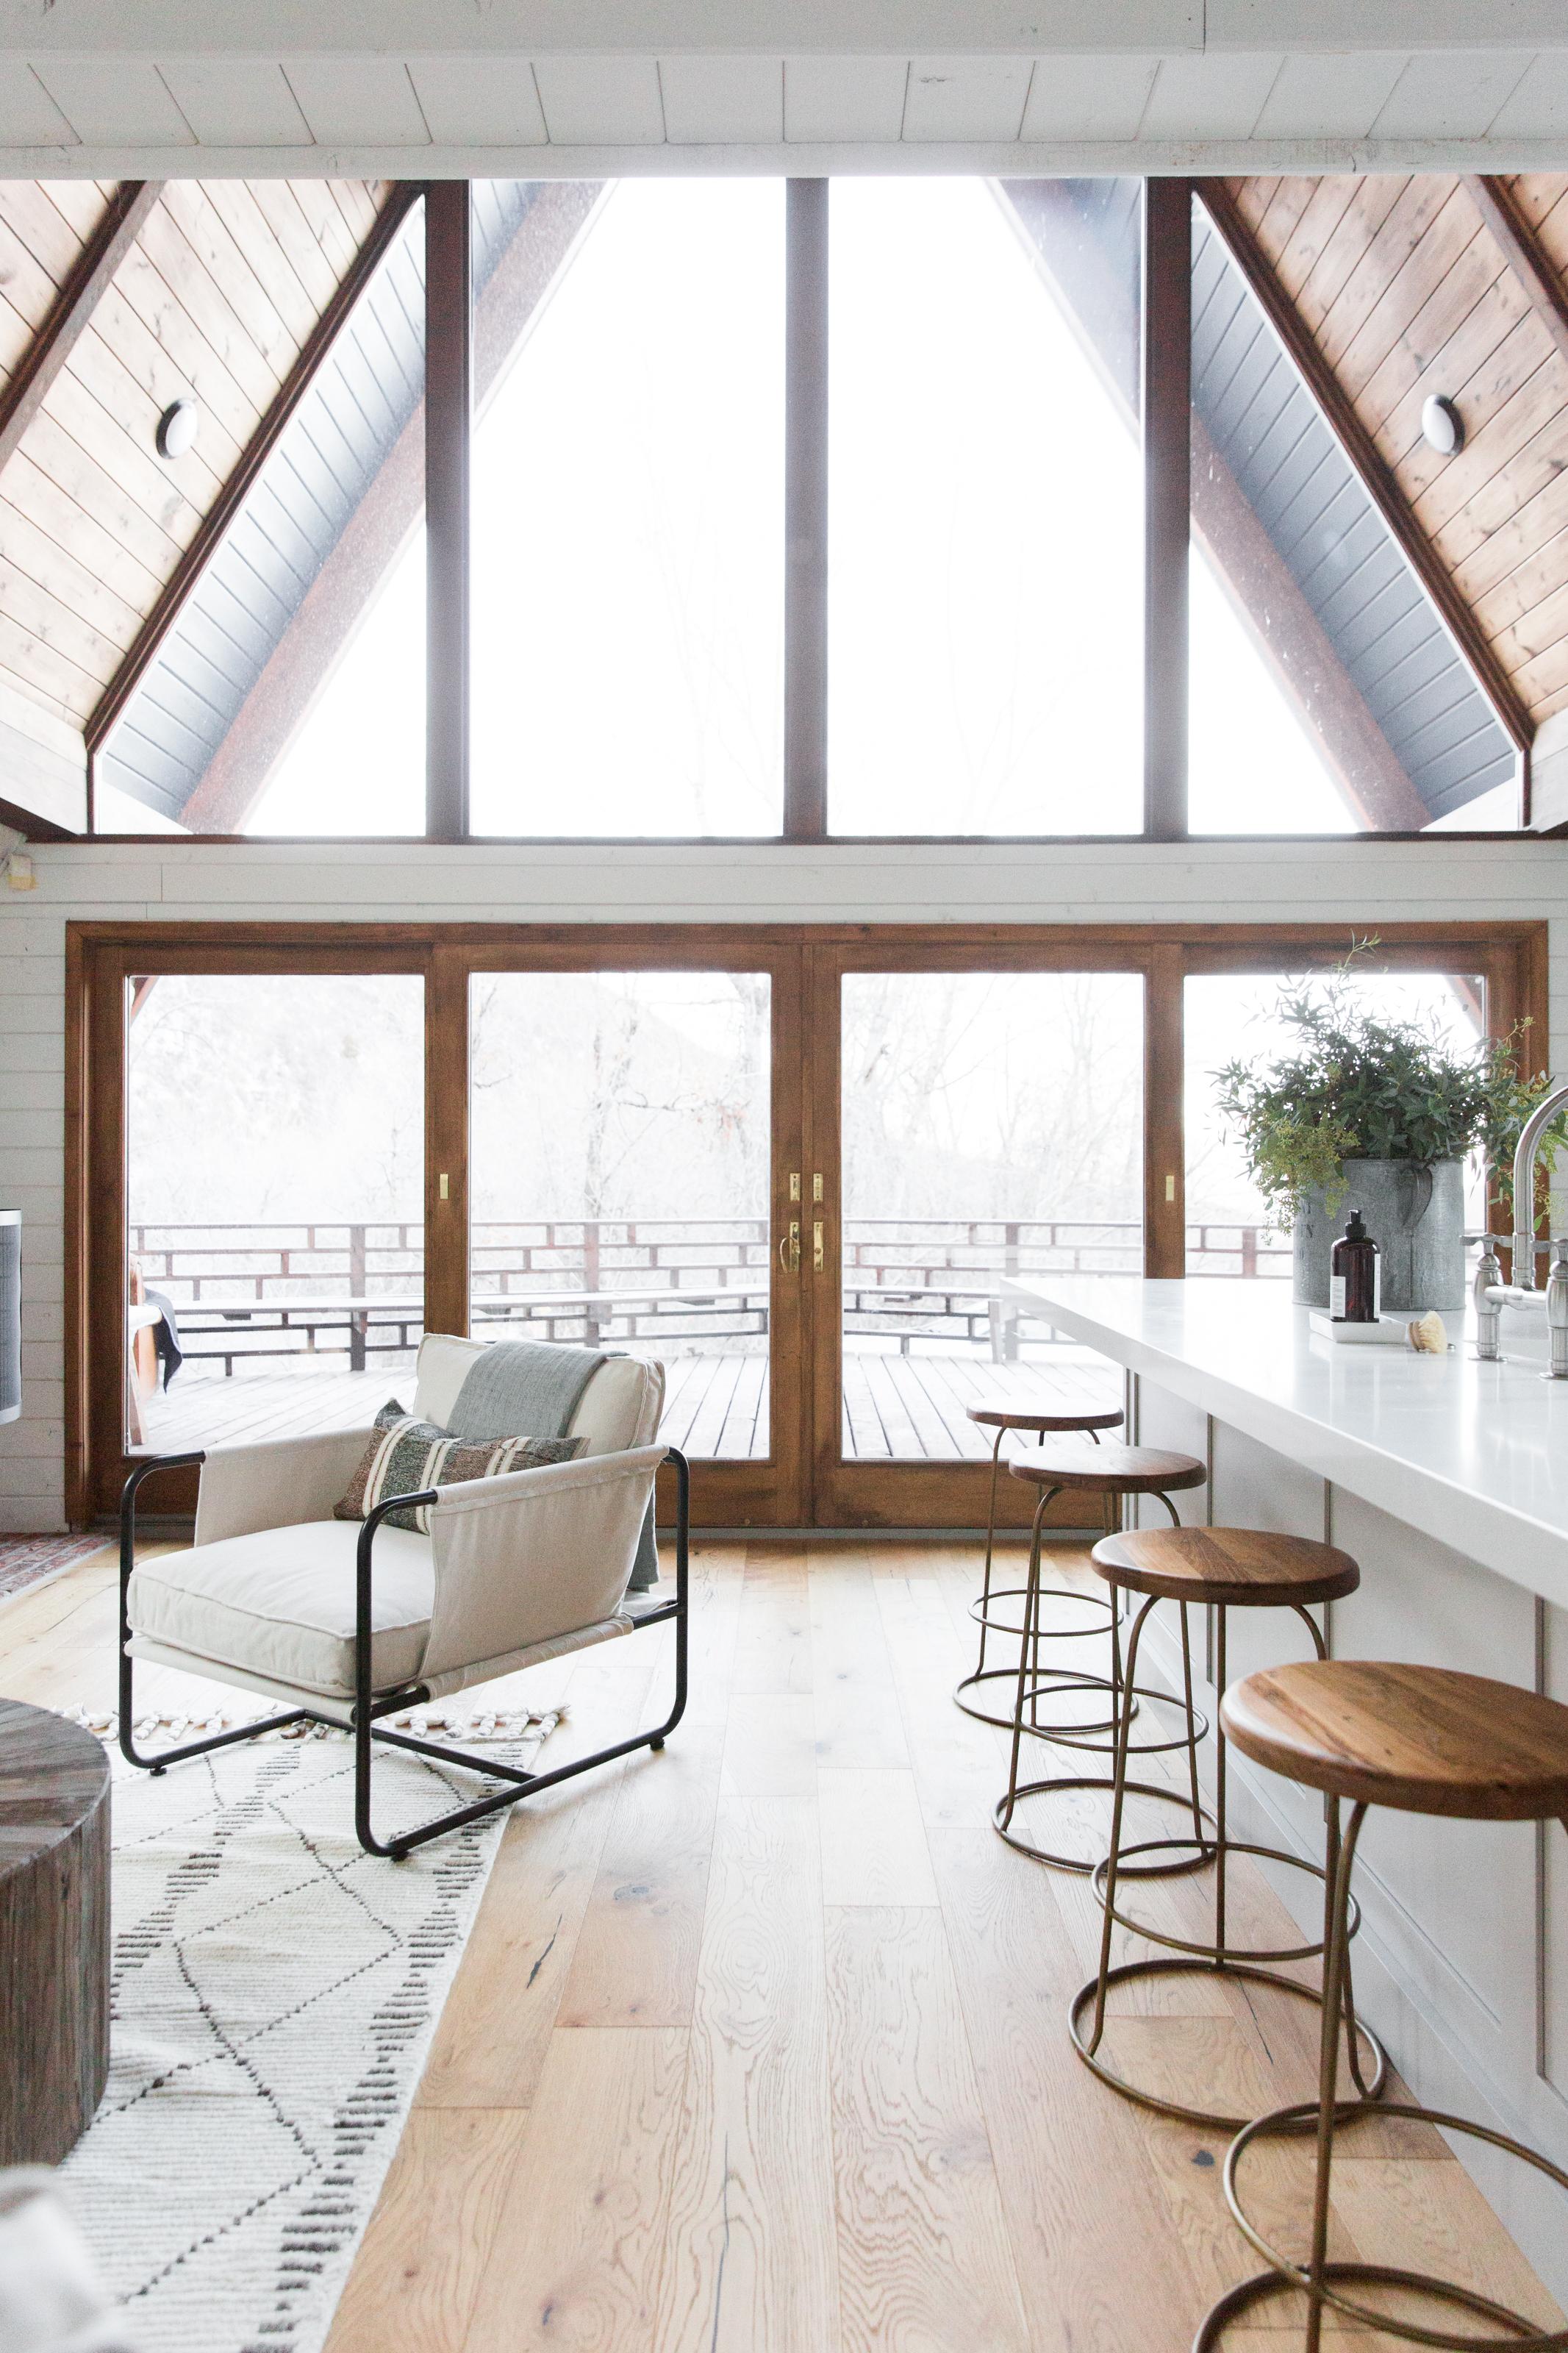 Designer home decor and furniture